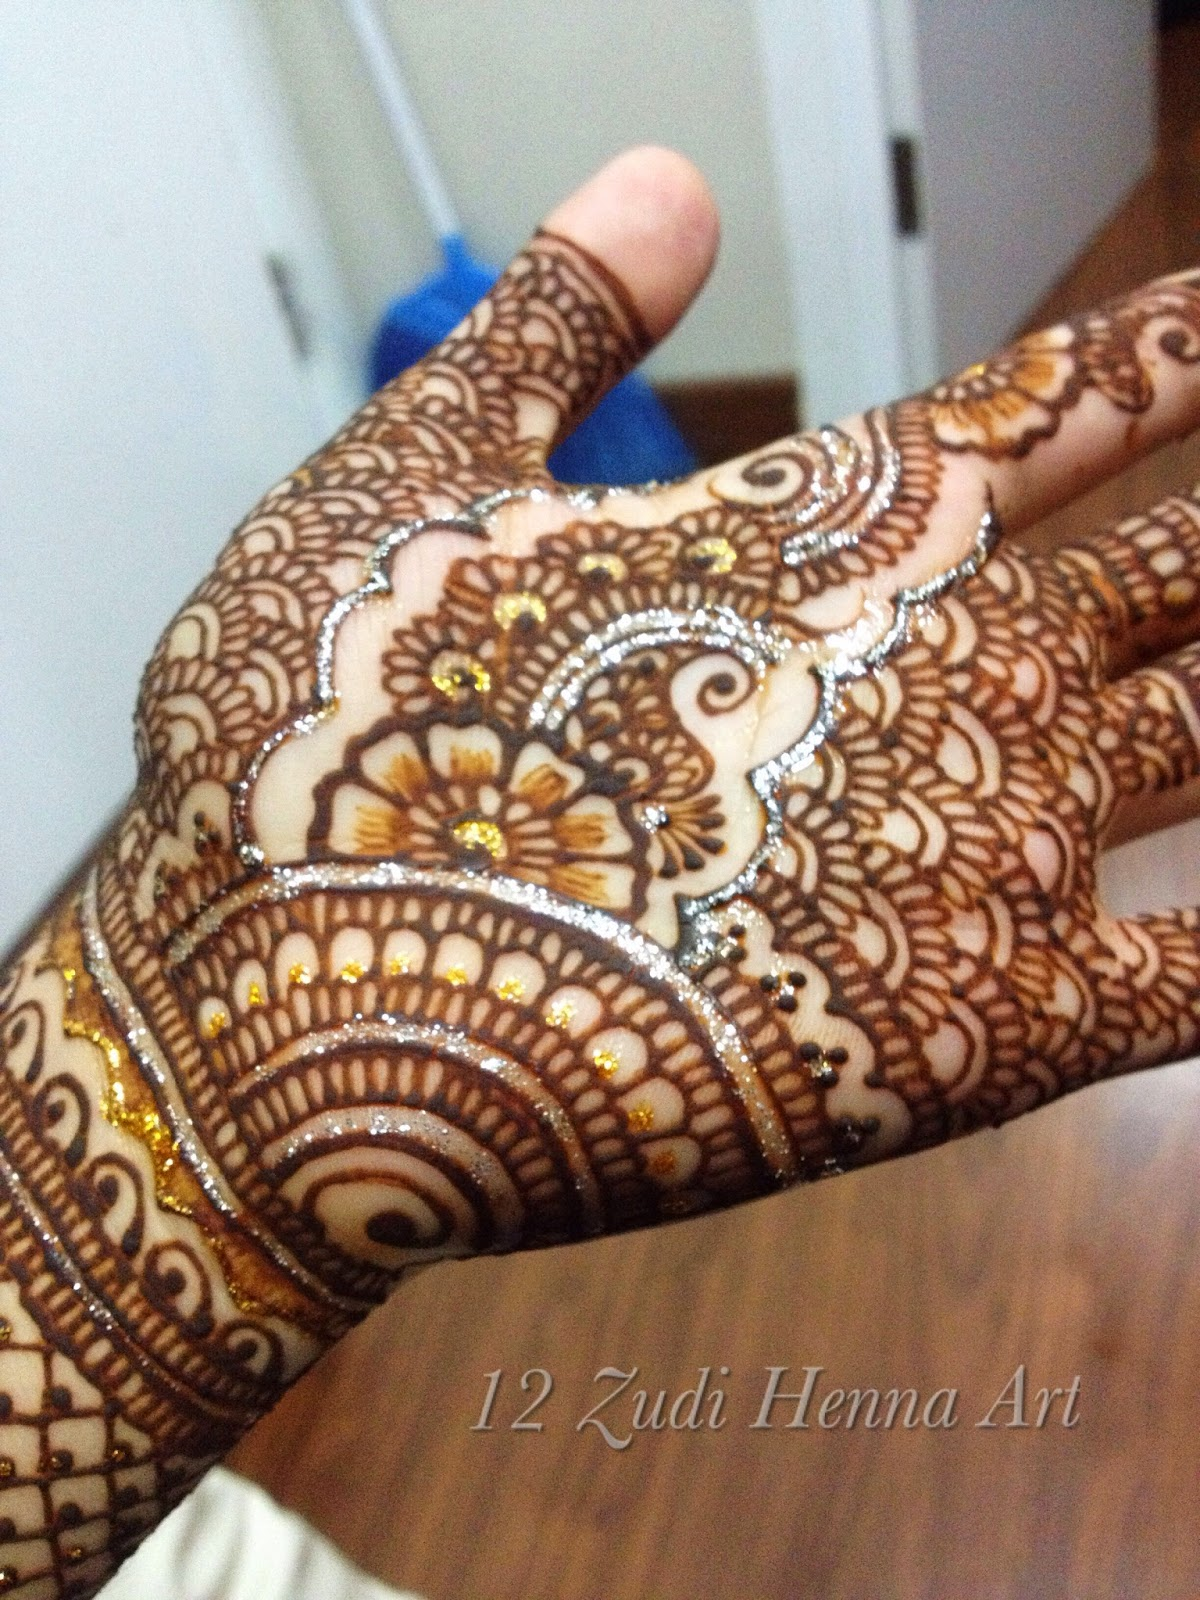 Gambar Henna Di Tangan Orang India Balehenna